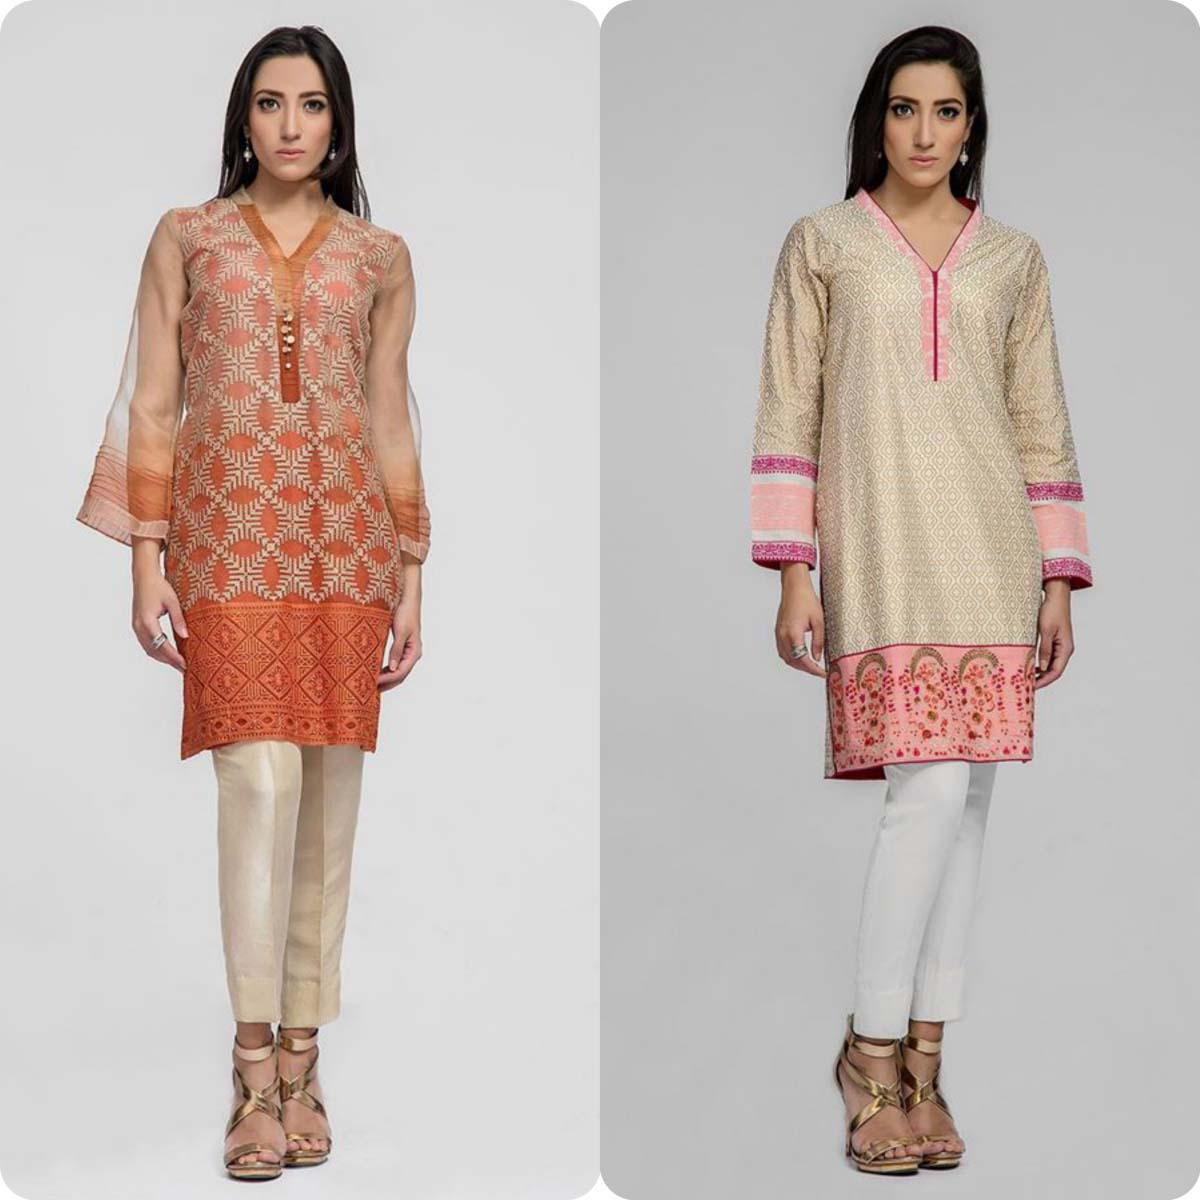 Deepak perwani Luxury Pret Eid Collection for Men and Women 2016-2017 (4)